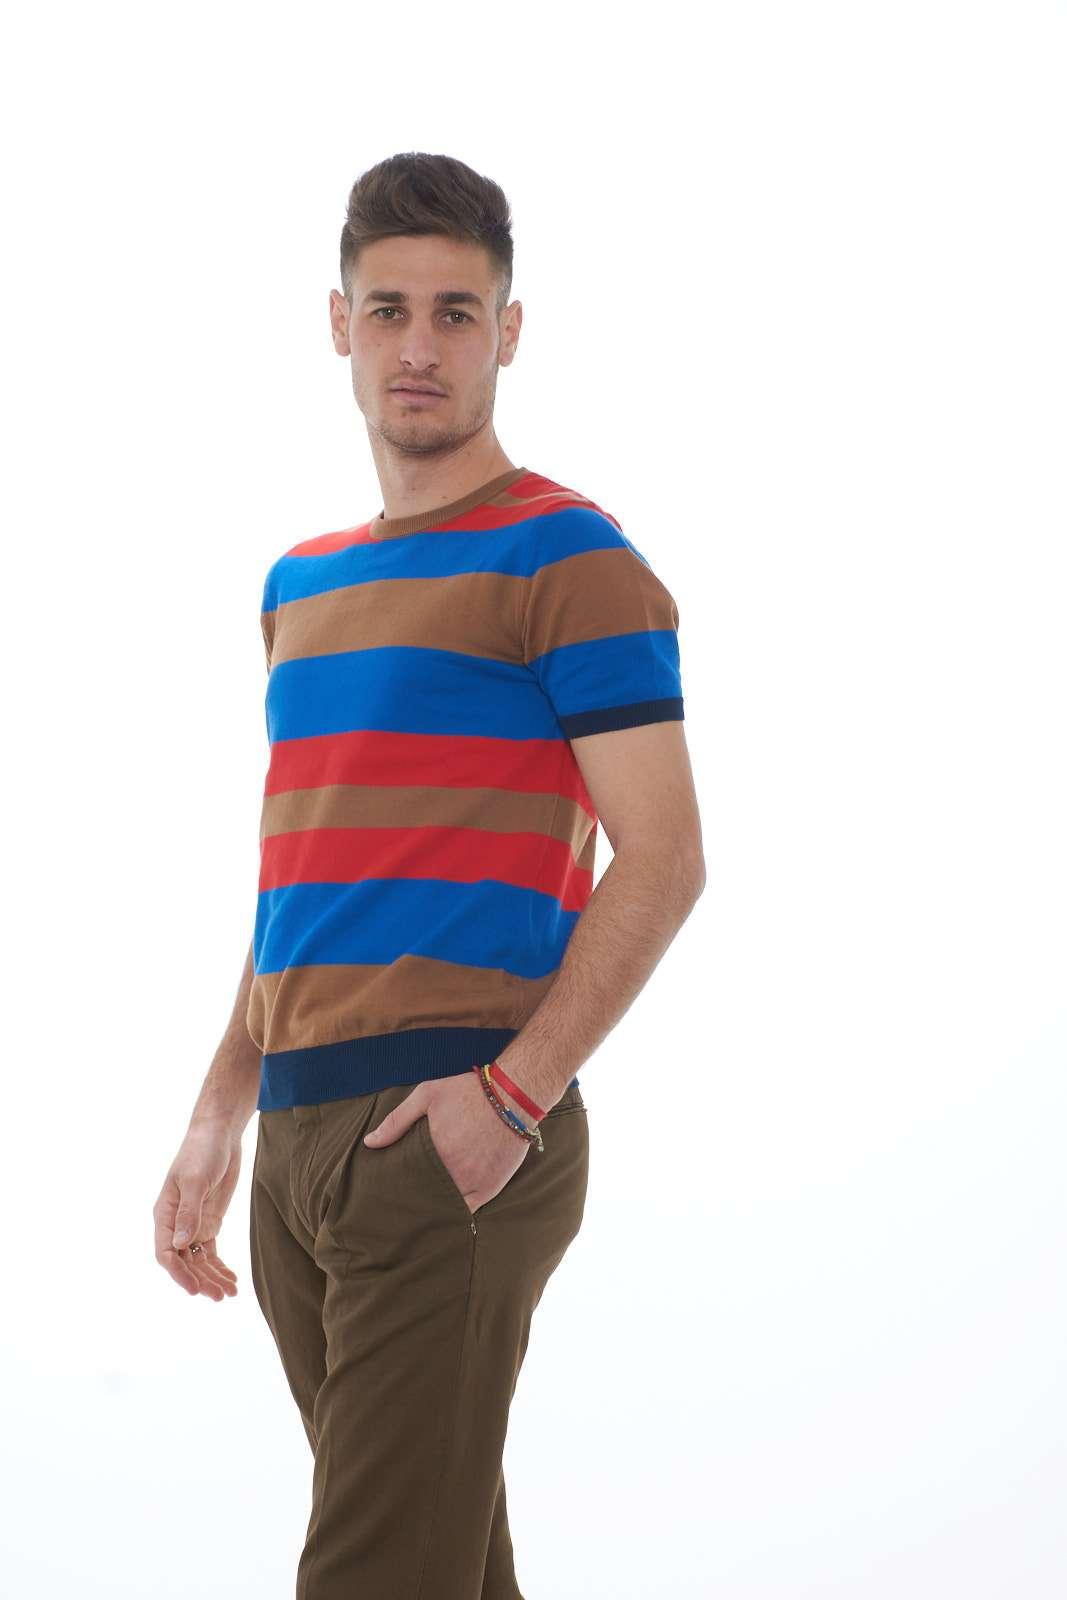 https://www.parmax.com/media/catalog/product/a/i/PE-outlet_parmax-t-shirt-uomo-Manuel-Ritz-2632m517%20193393-B.jpg